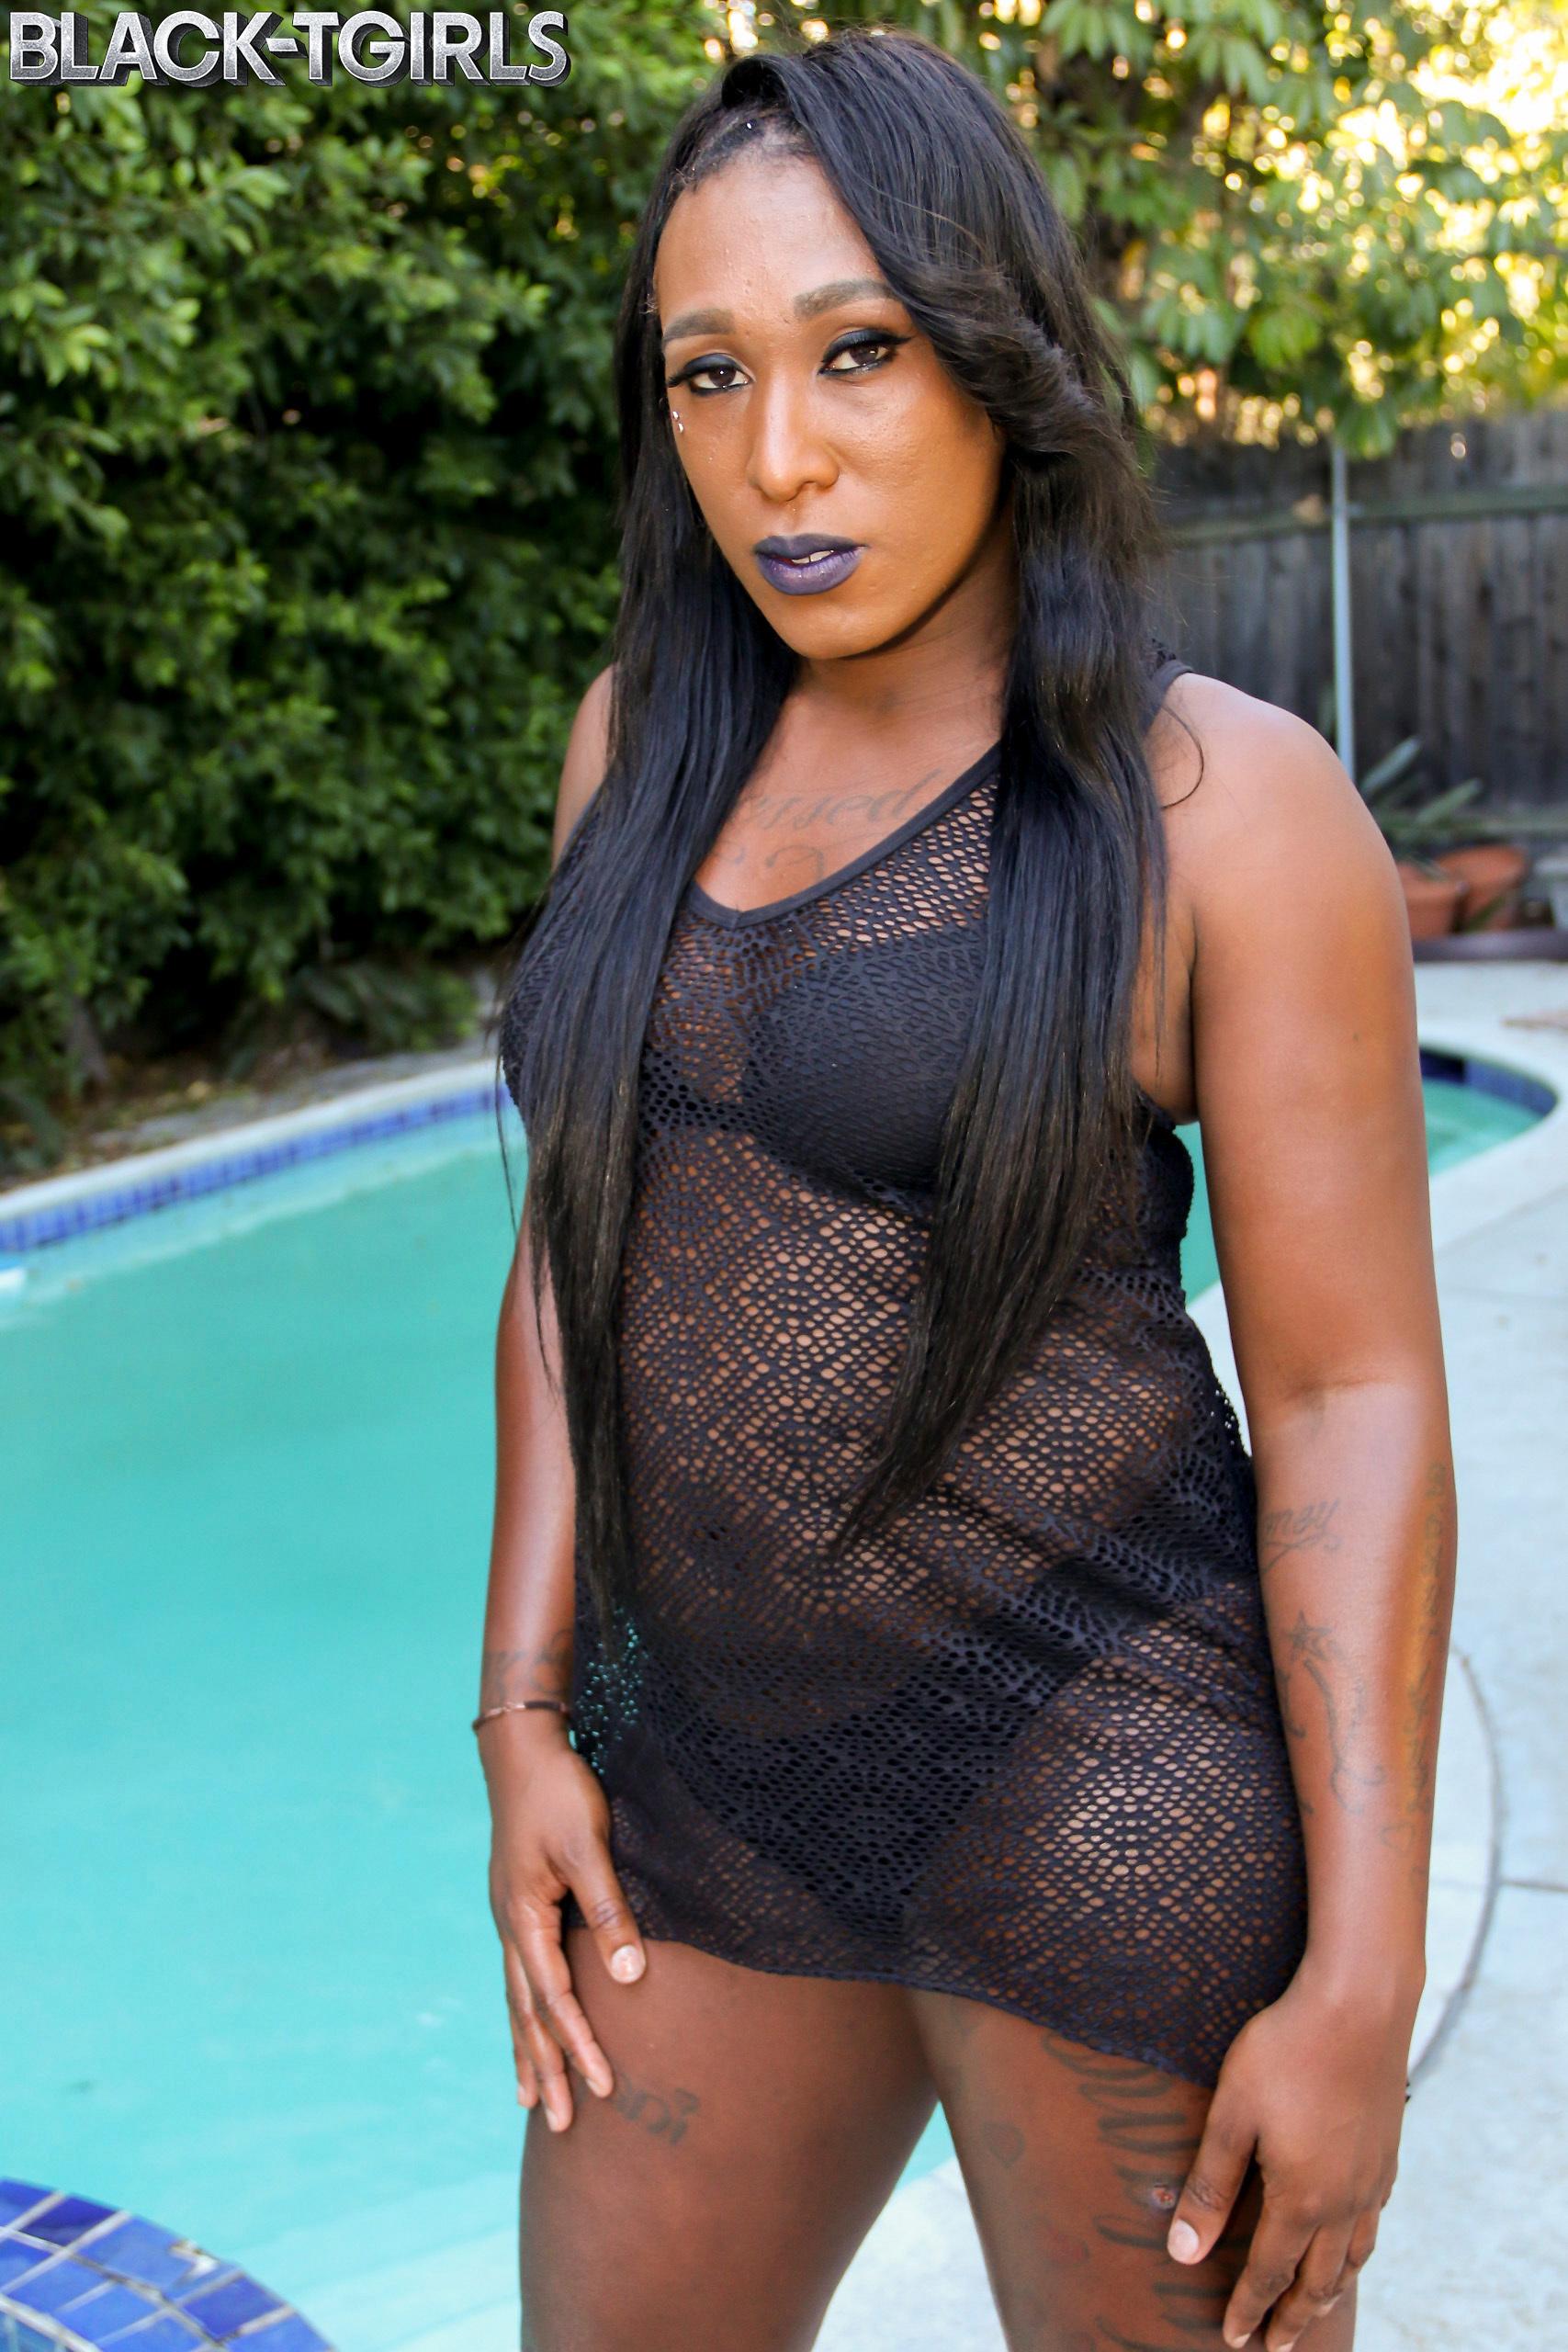 Brianna Is A Filthy Black Tranny With A Yummy Soft Body, Tiny